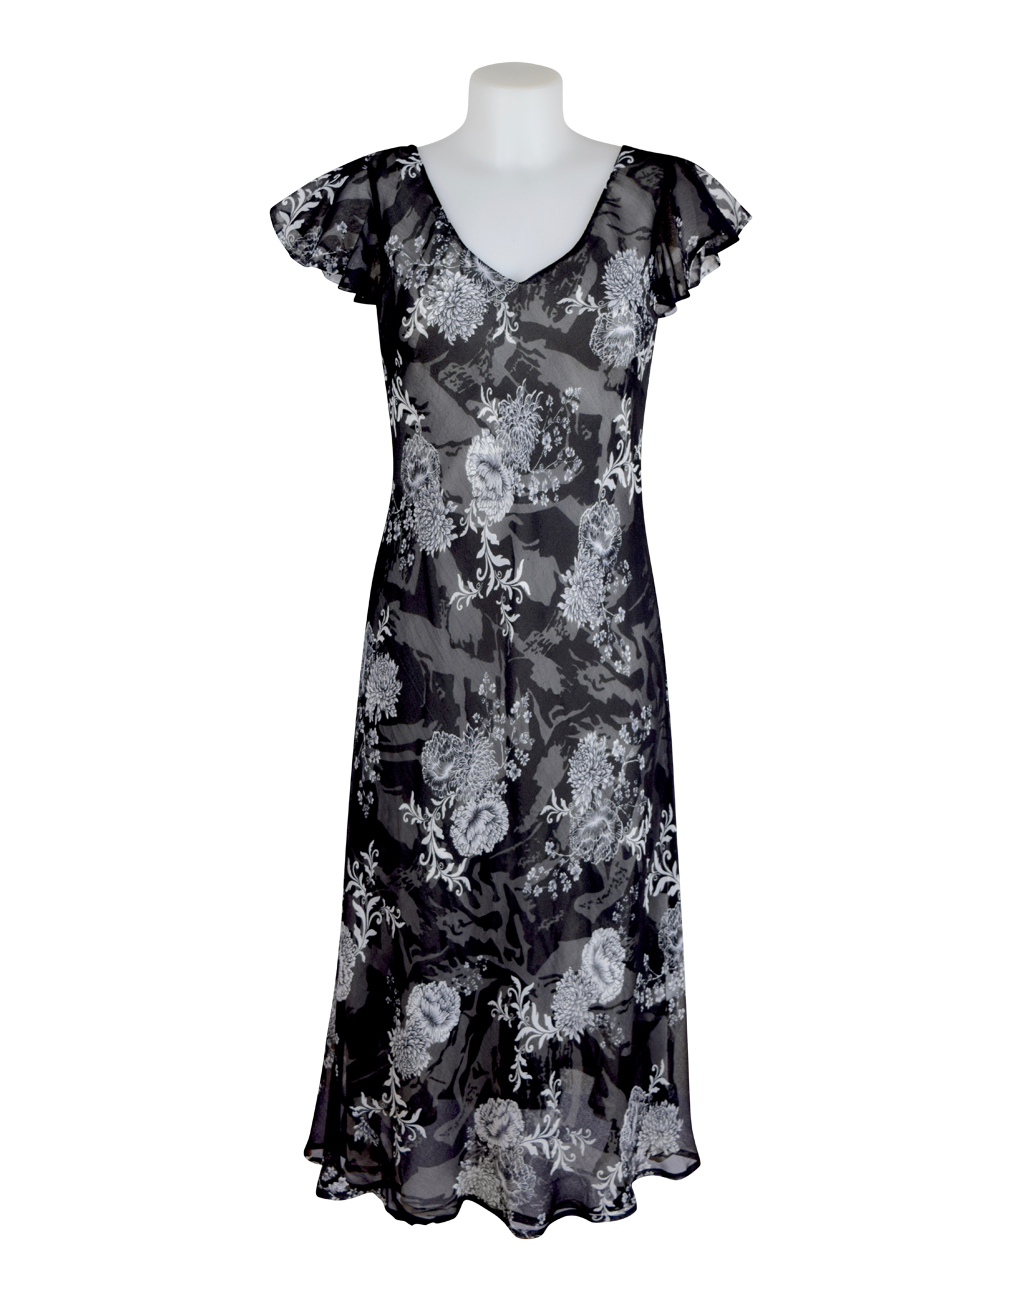 Paramour Reversible Dress Cap Sleeve Black & White8